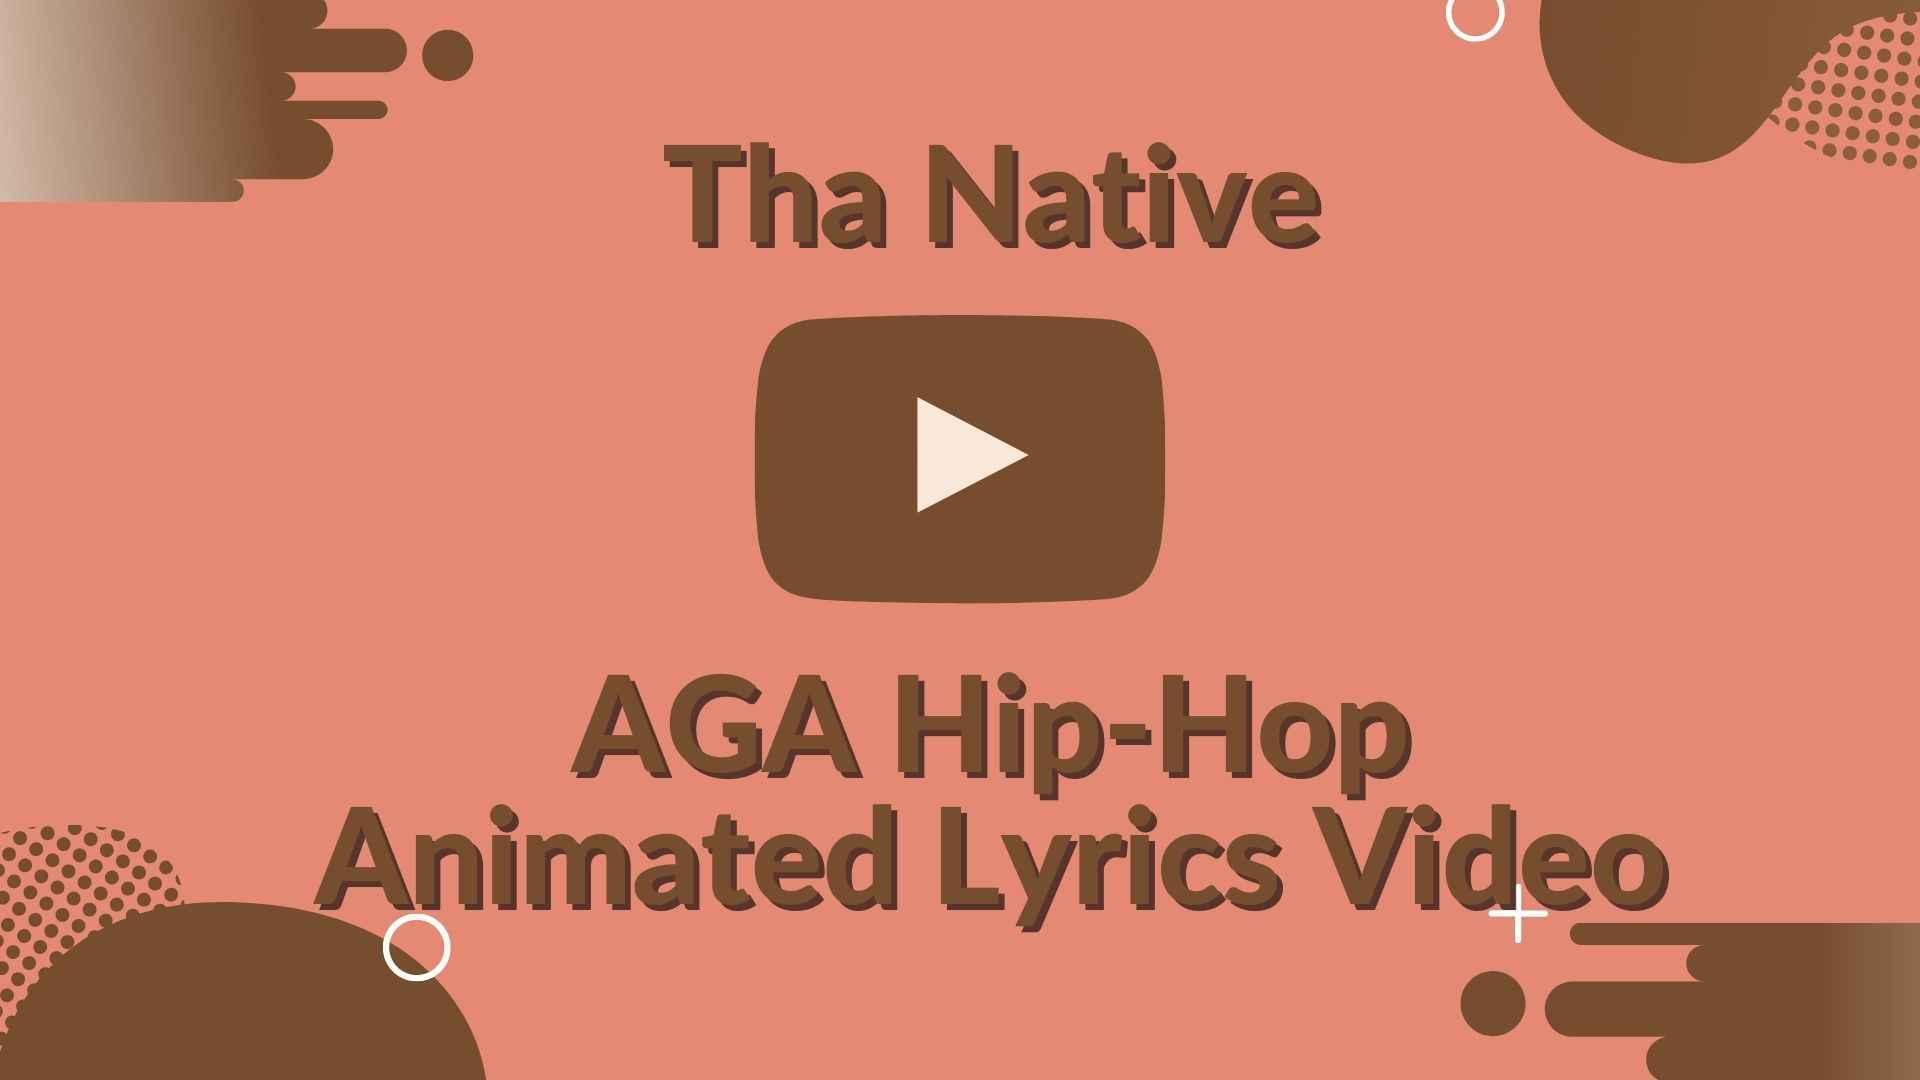 Tha Native - AGA Hip-Hop Animated Lyrics Video